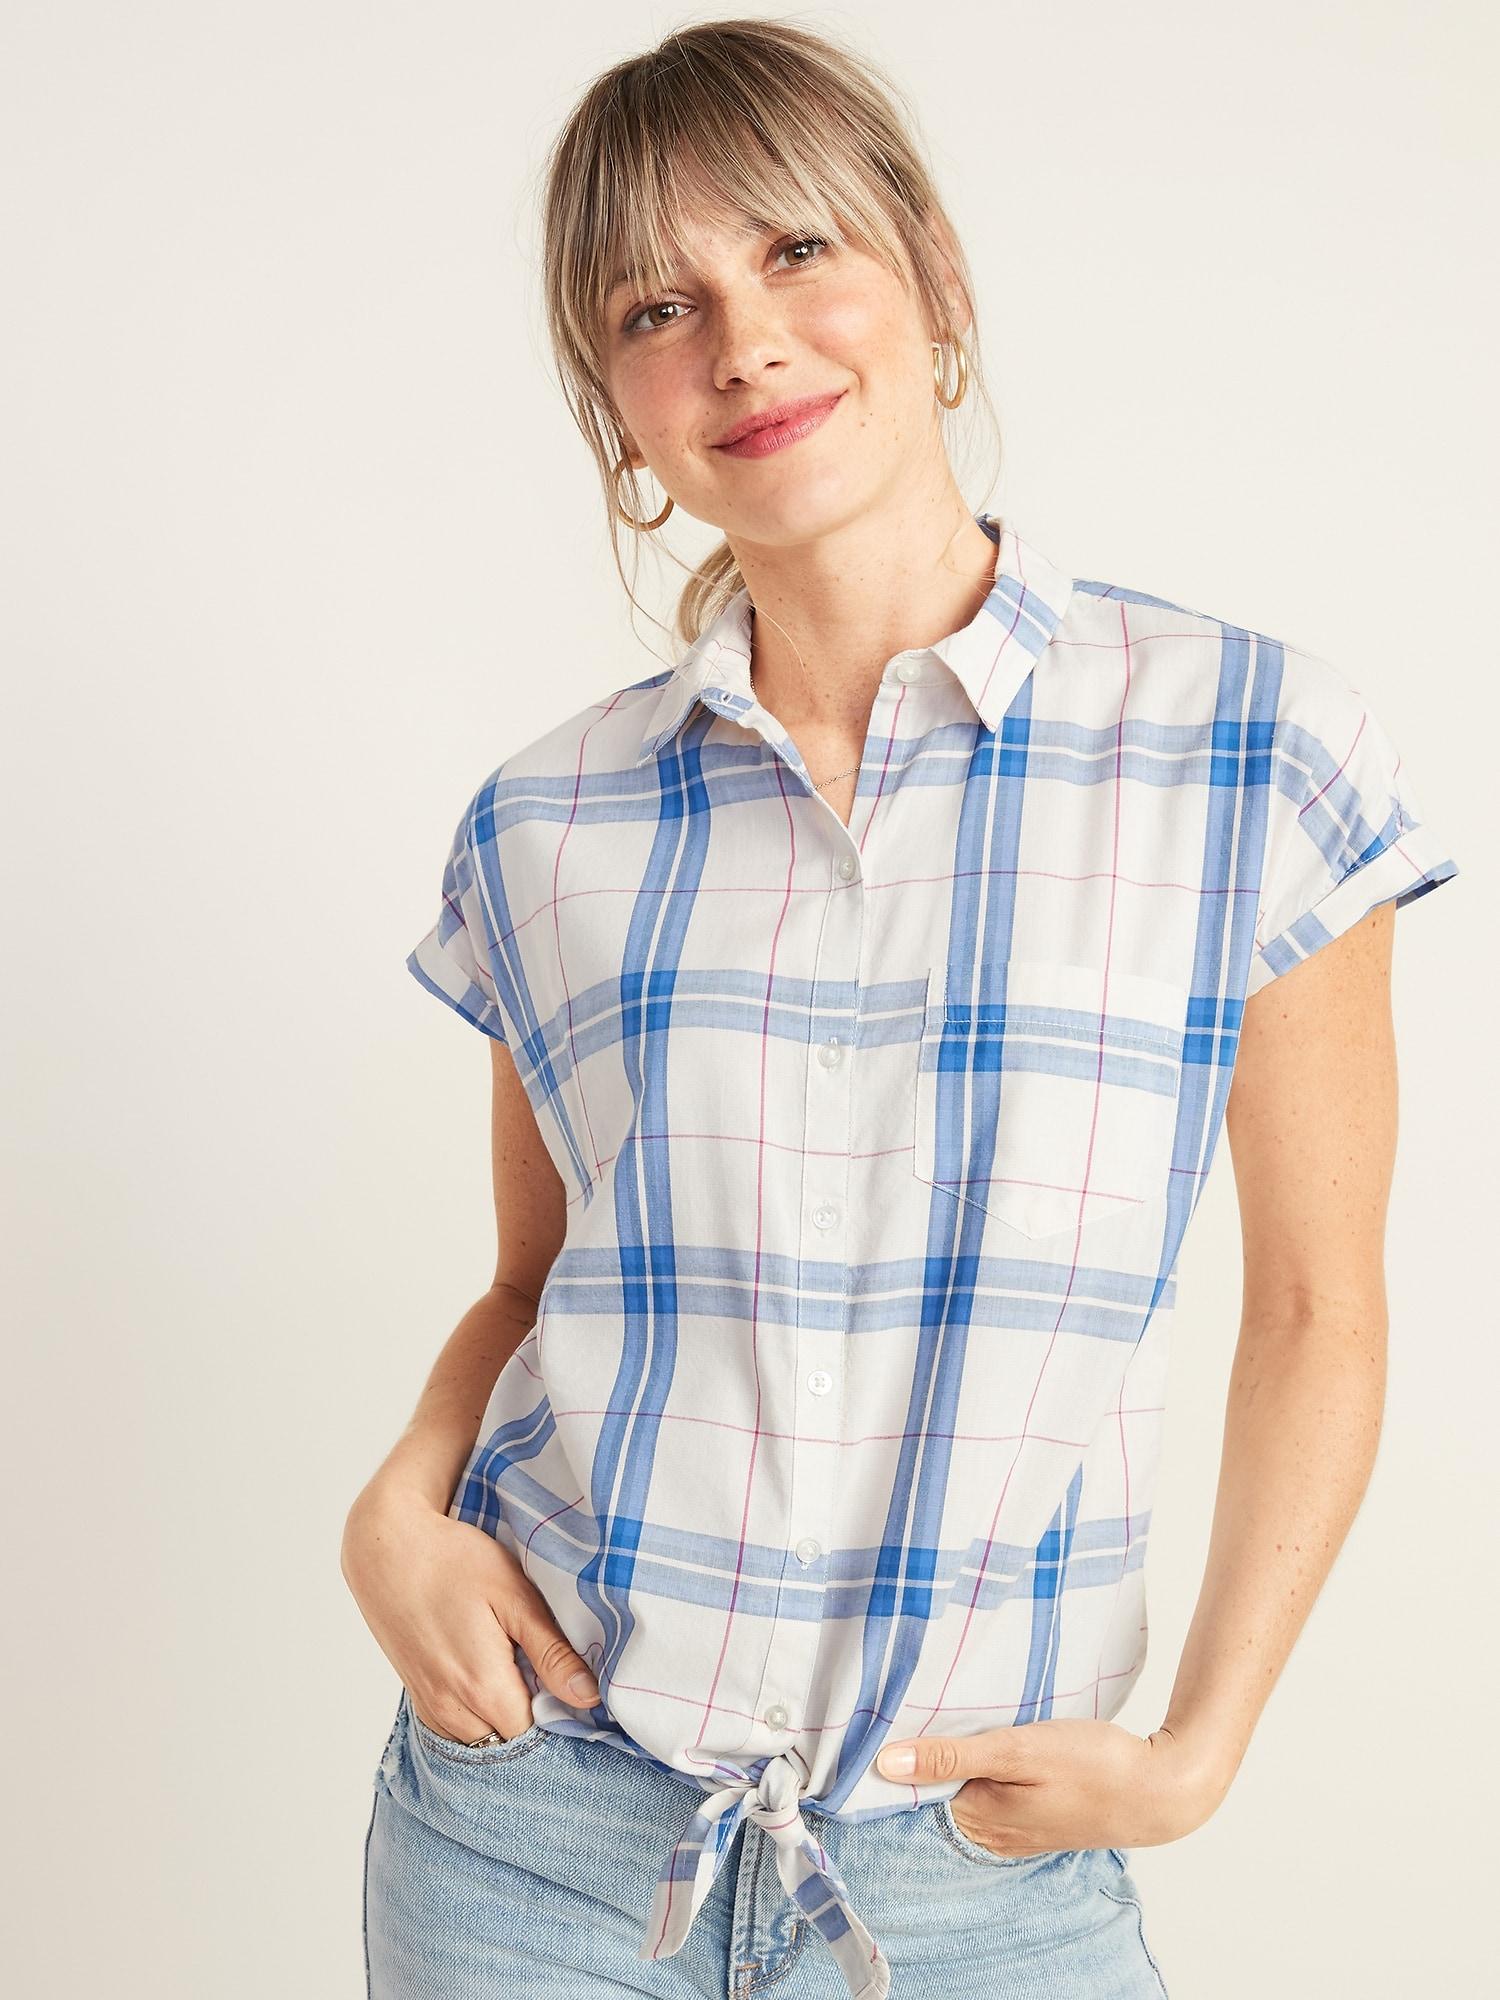 451dac949 Patterned Tie-Hem Shirt for Women   Old Navy